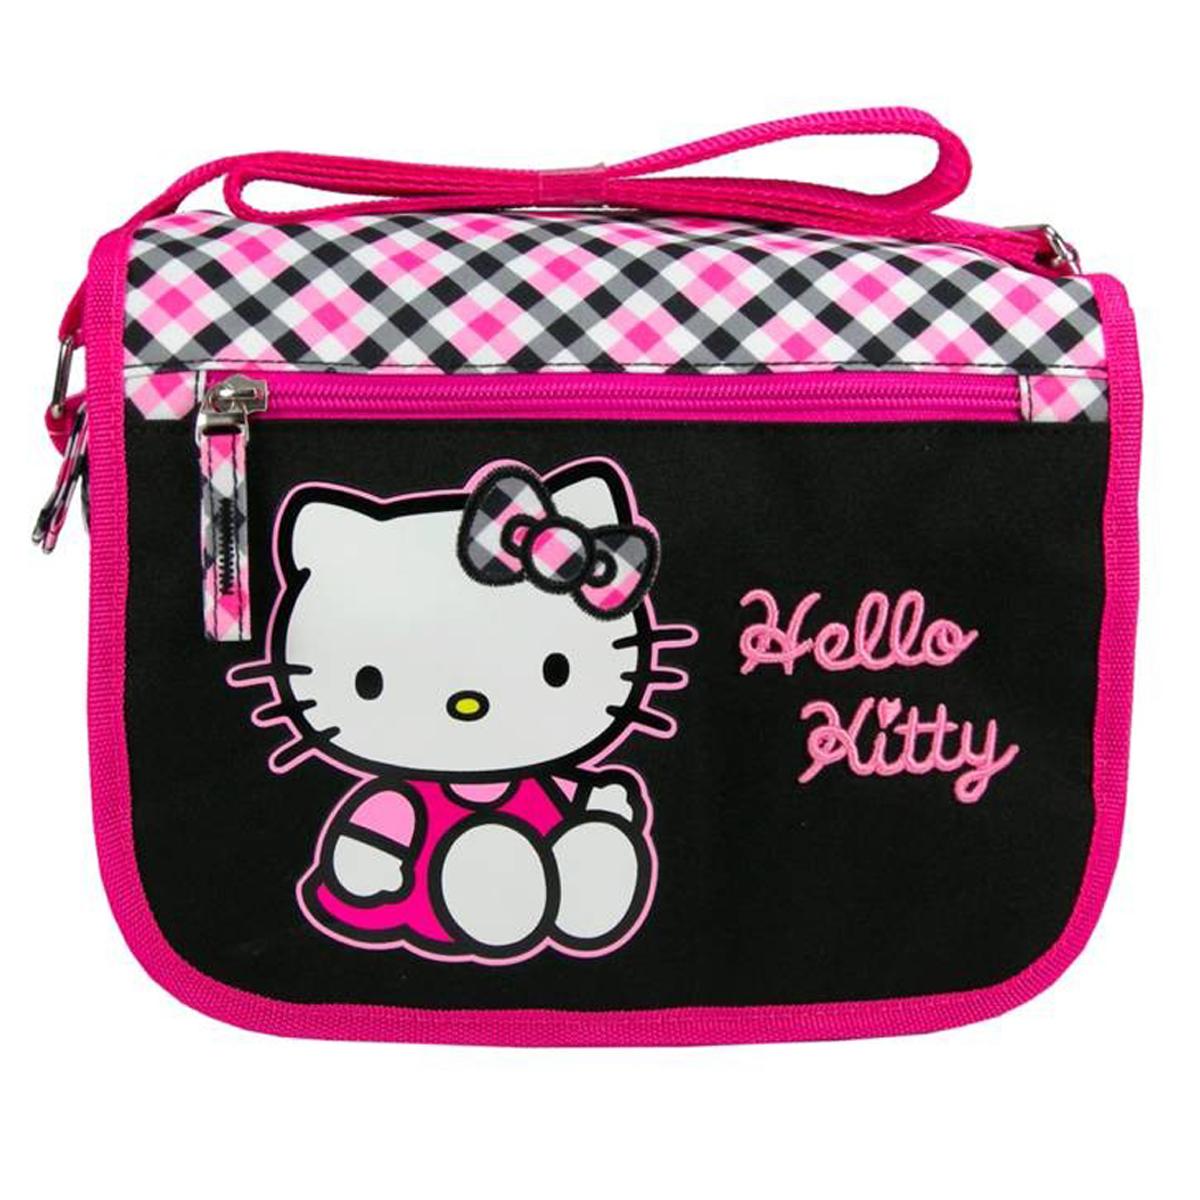 Sac \'Hello Kitty\' noir rose - 24x20x8 cm - [J6495]